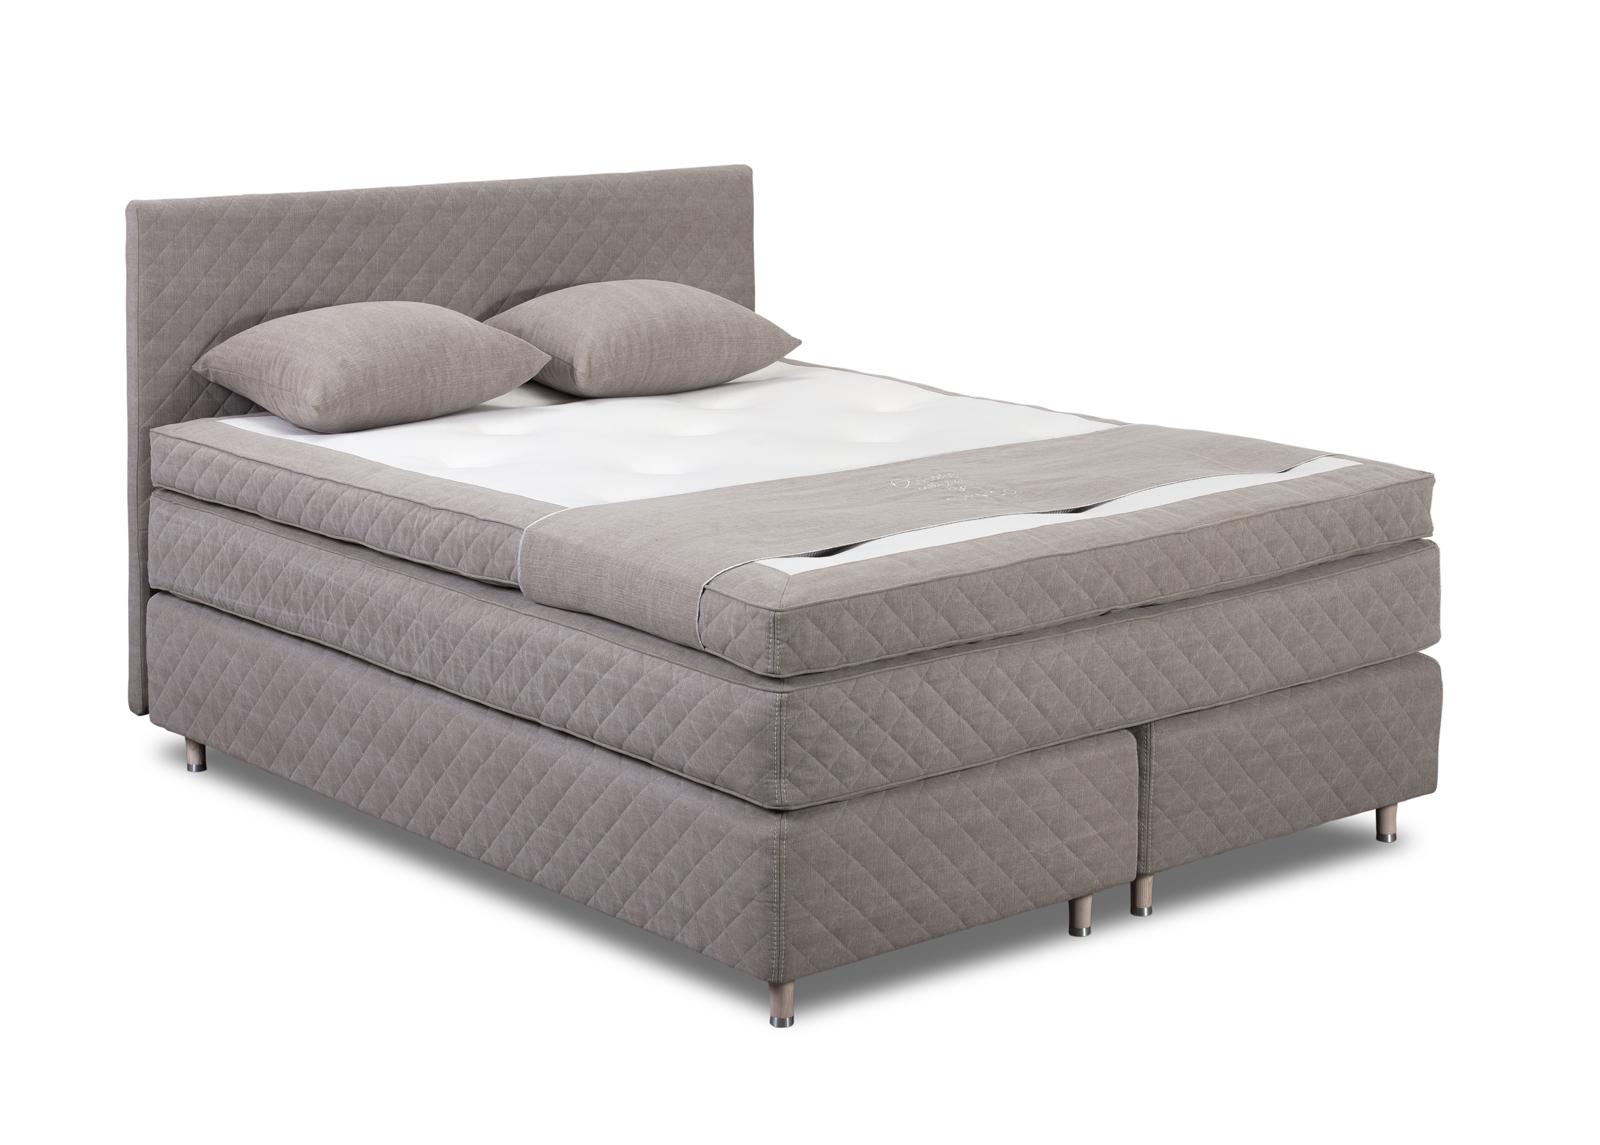 Comfort sänky Hypnos Diamond 180x200 cm